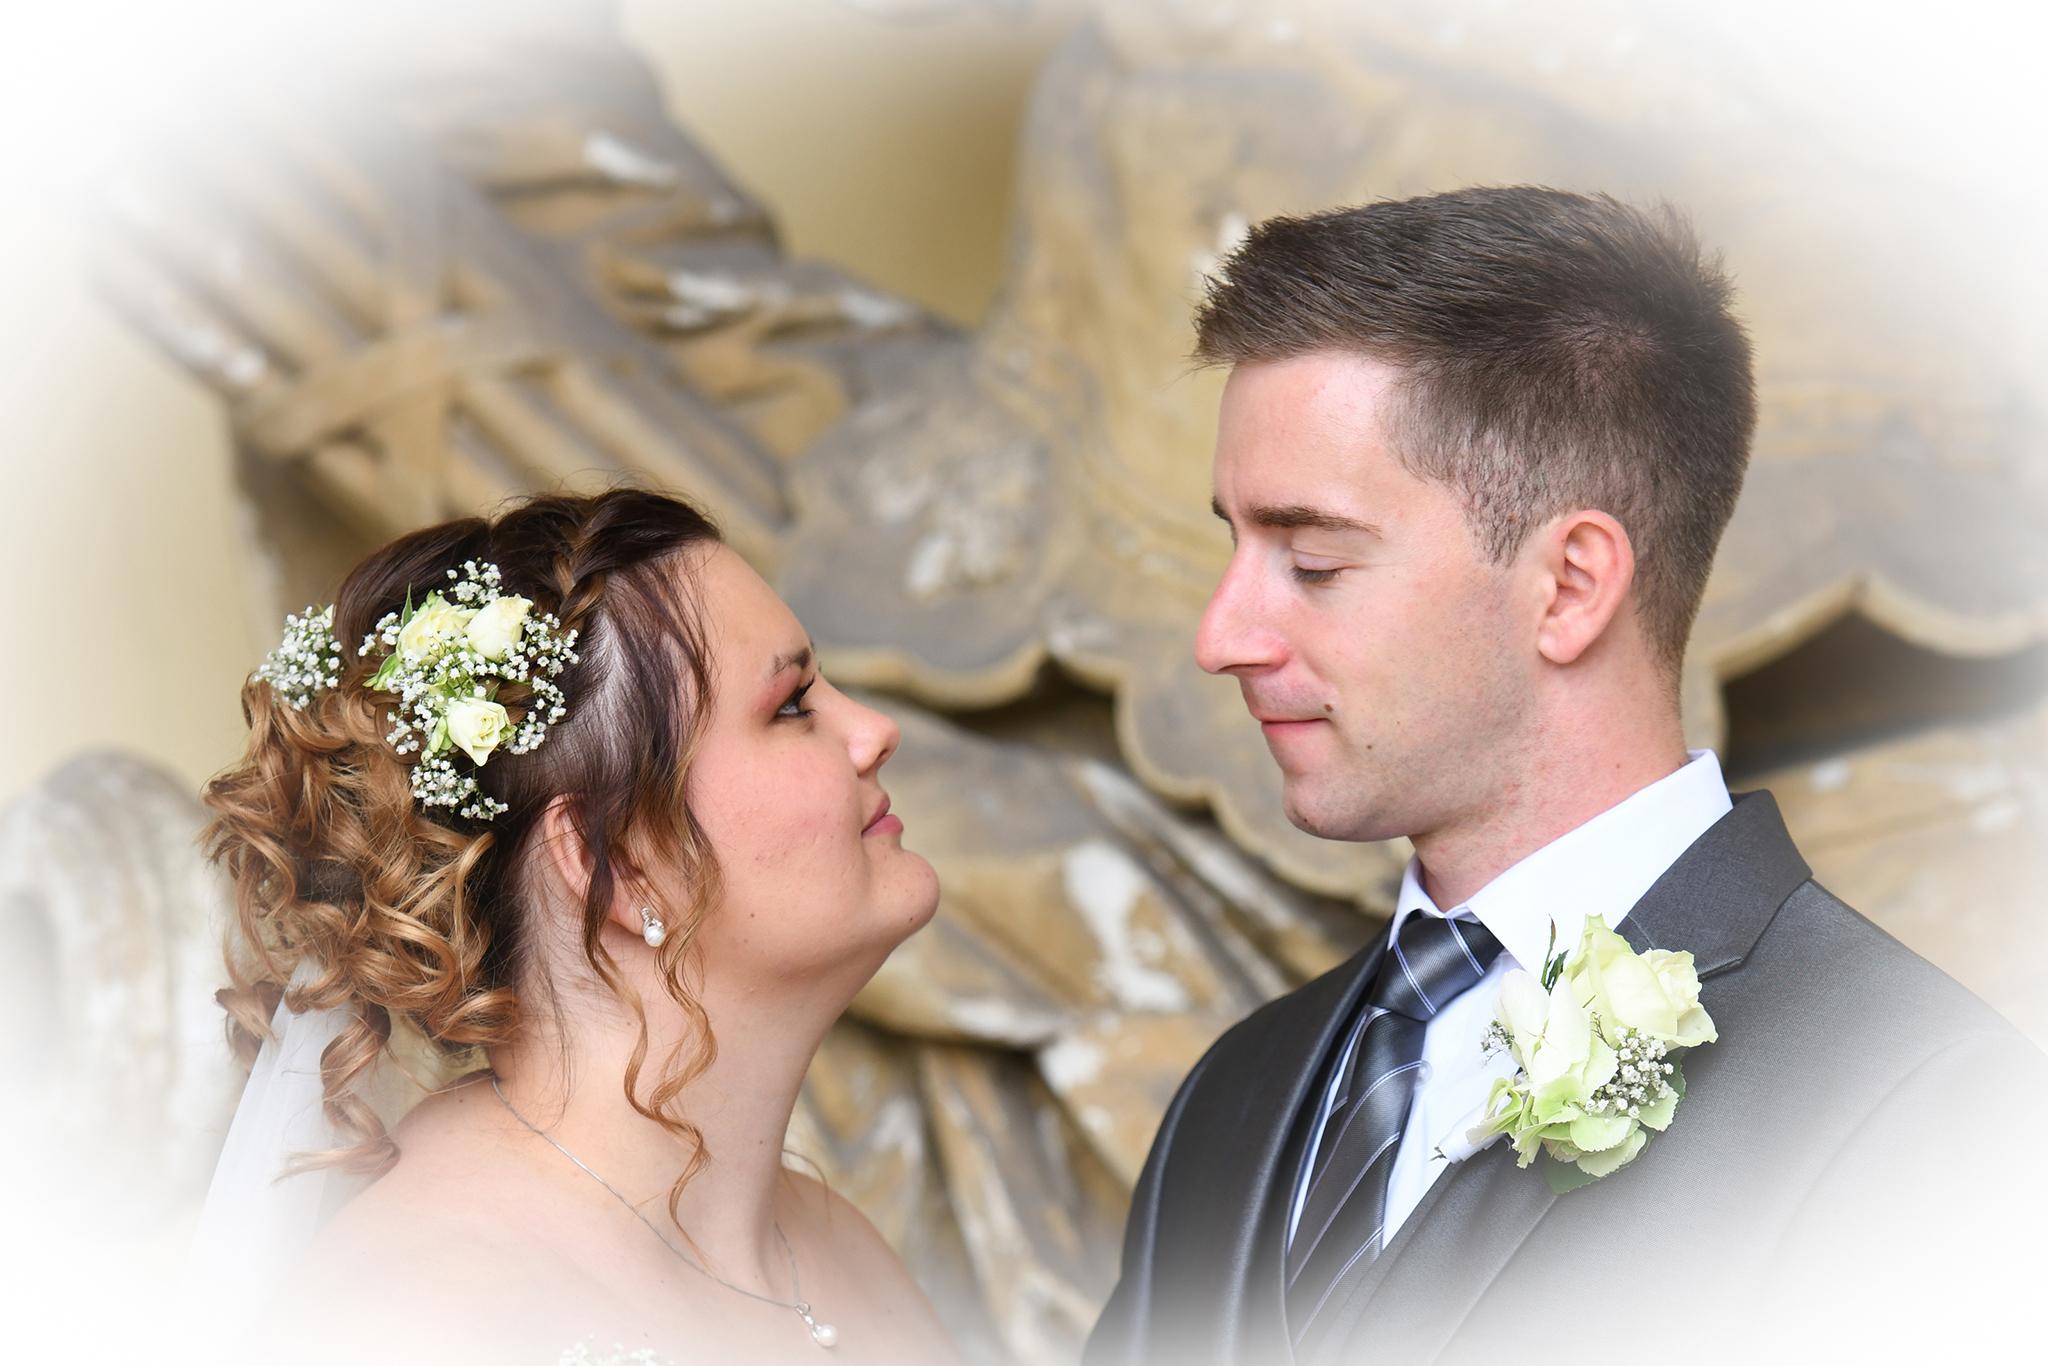 Fotodesig-Mentz-Hochzeit-Janina-Jens-007